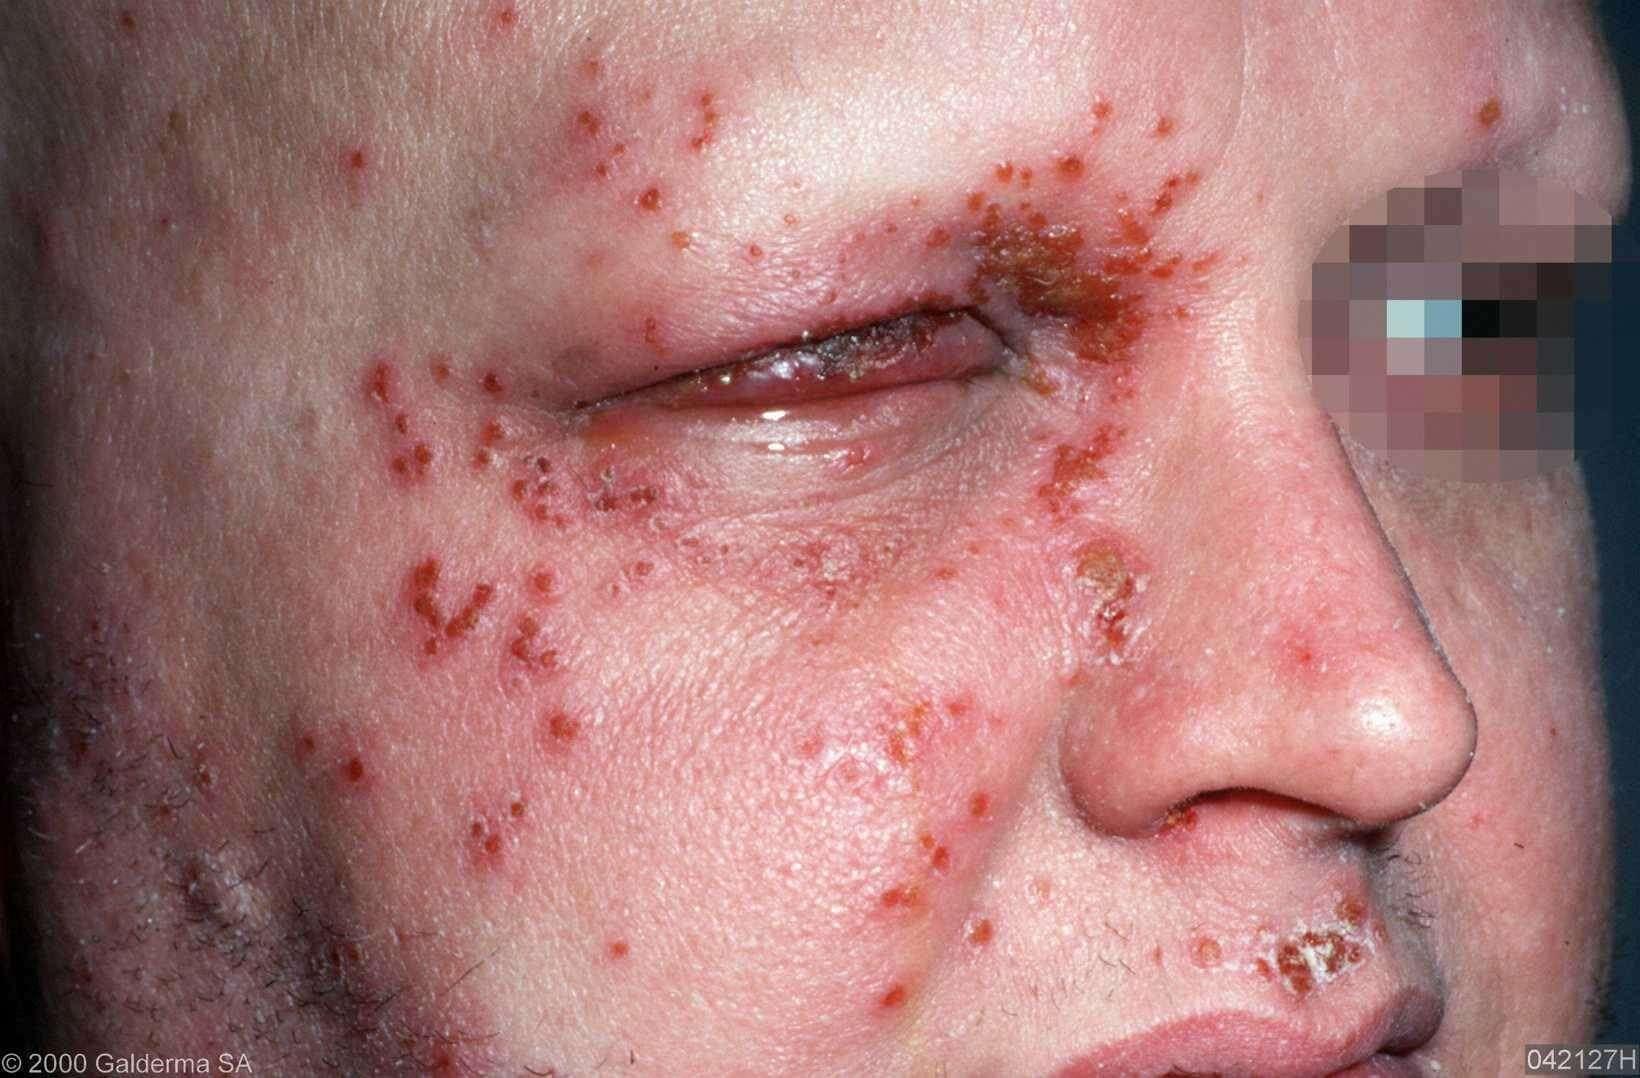 Chicken pox photos infant